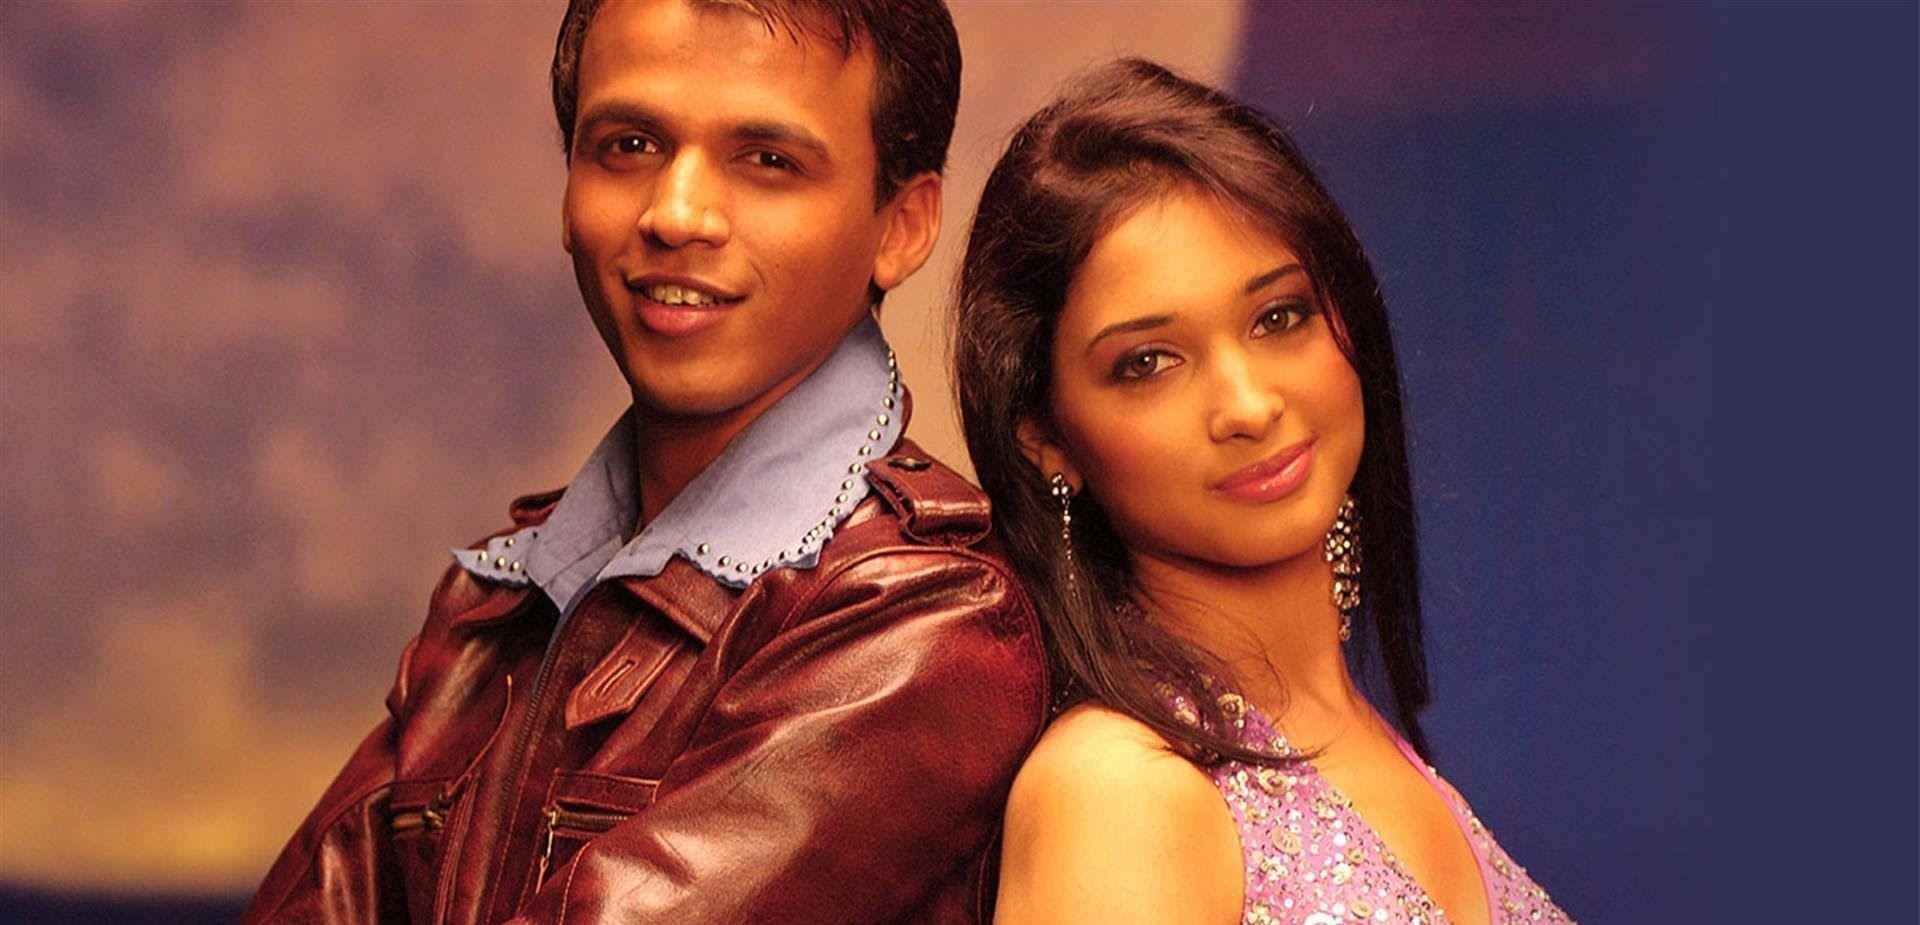 abjit and tamna